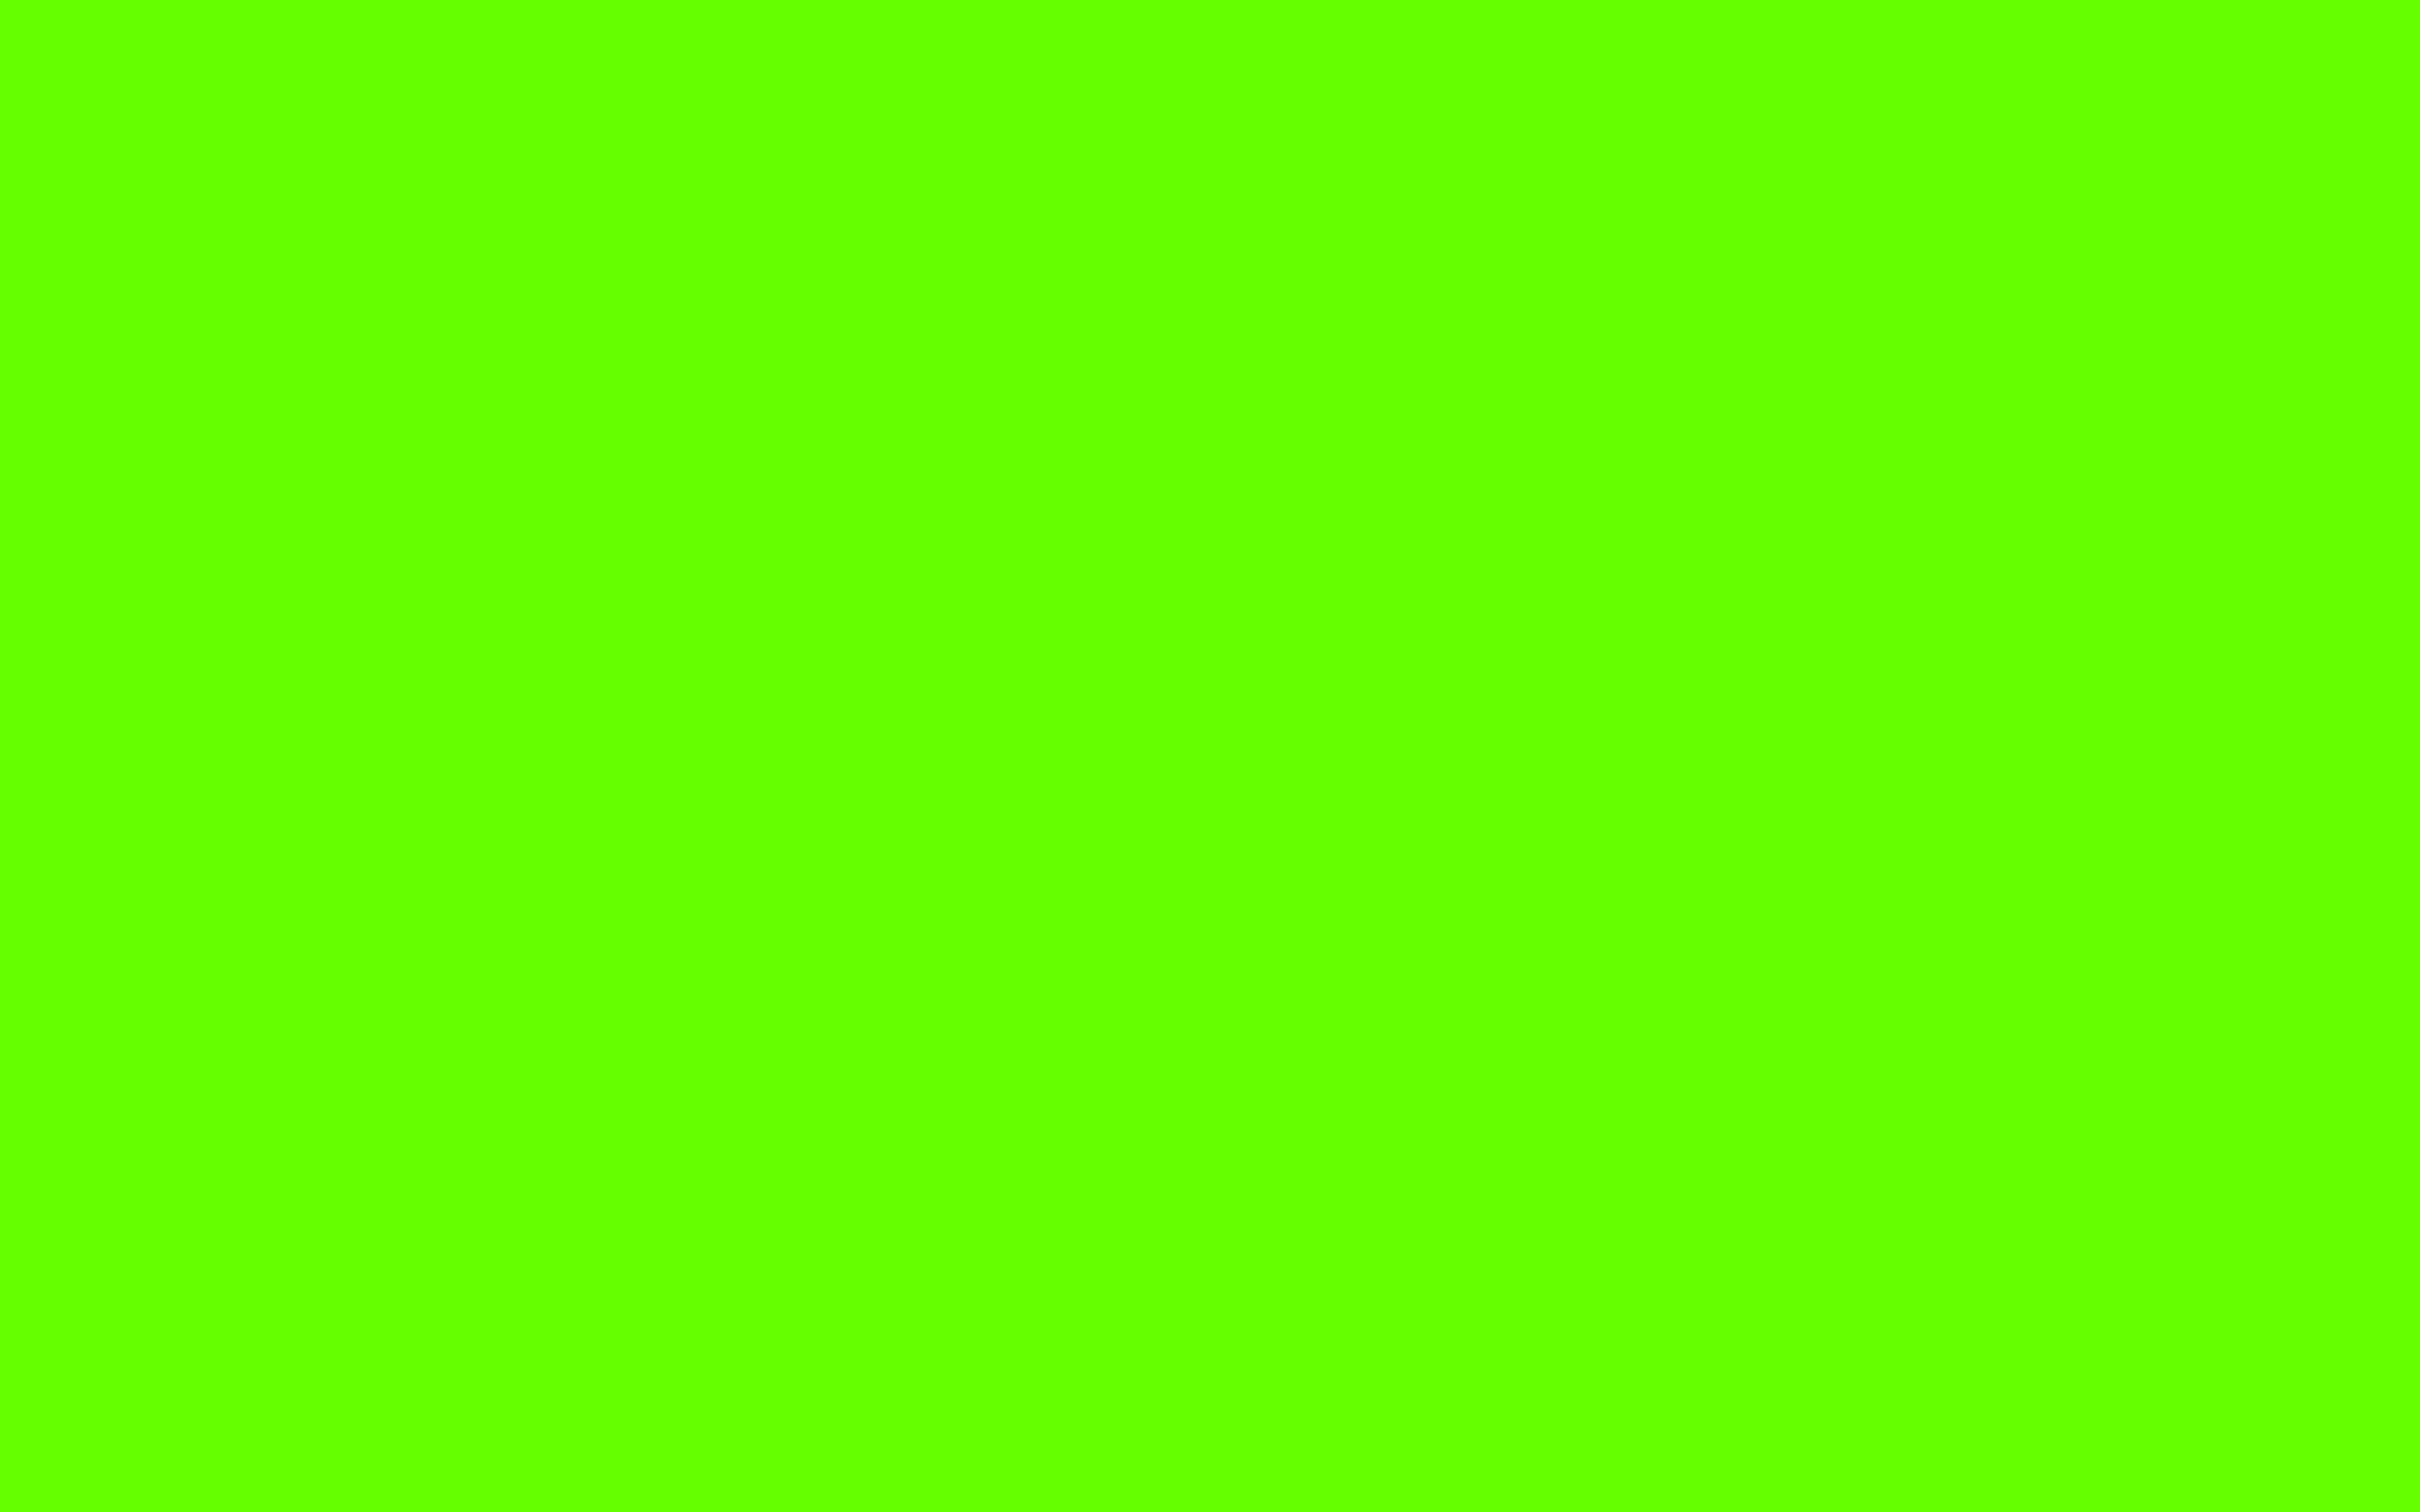 2560x1600 Bright Green Solid Color Backgrounds Desktop ... |Bright Green Color Background